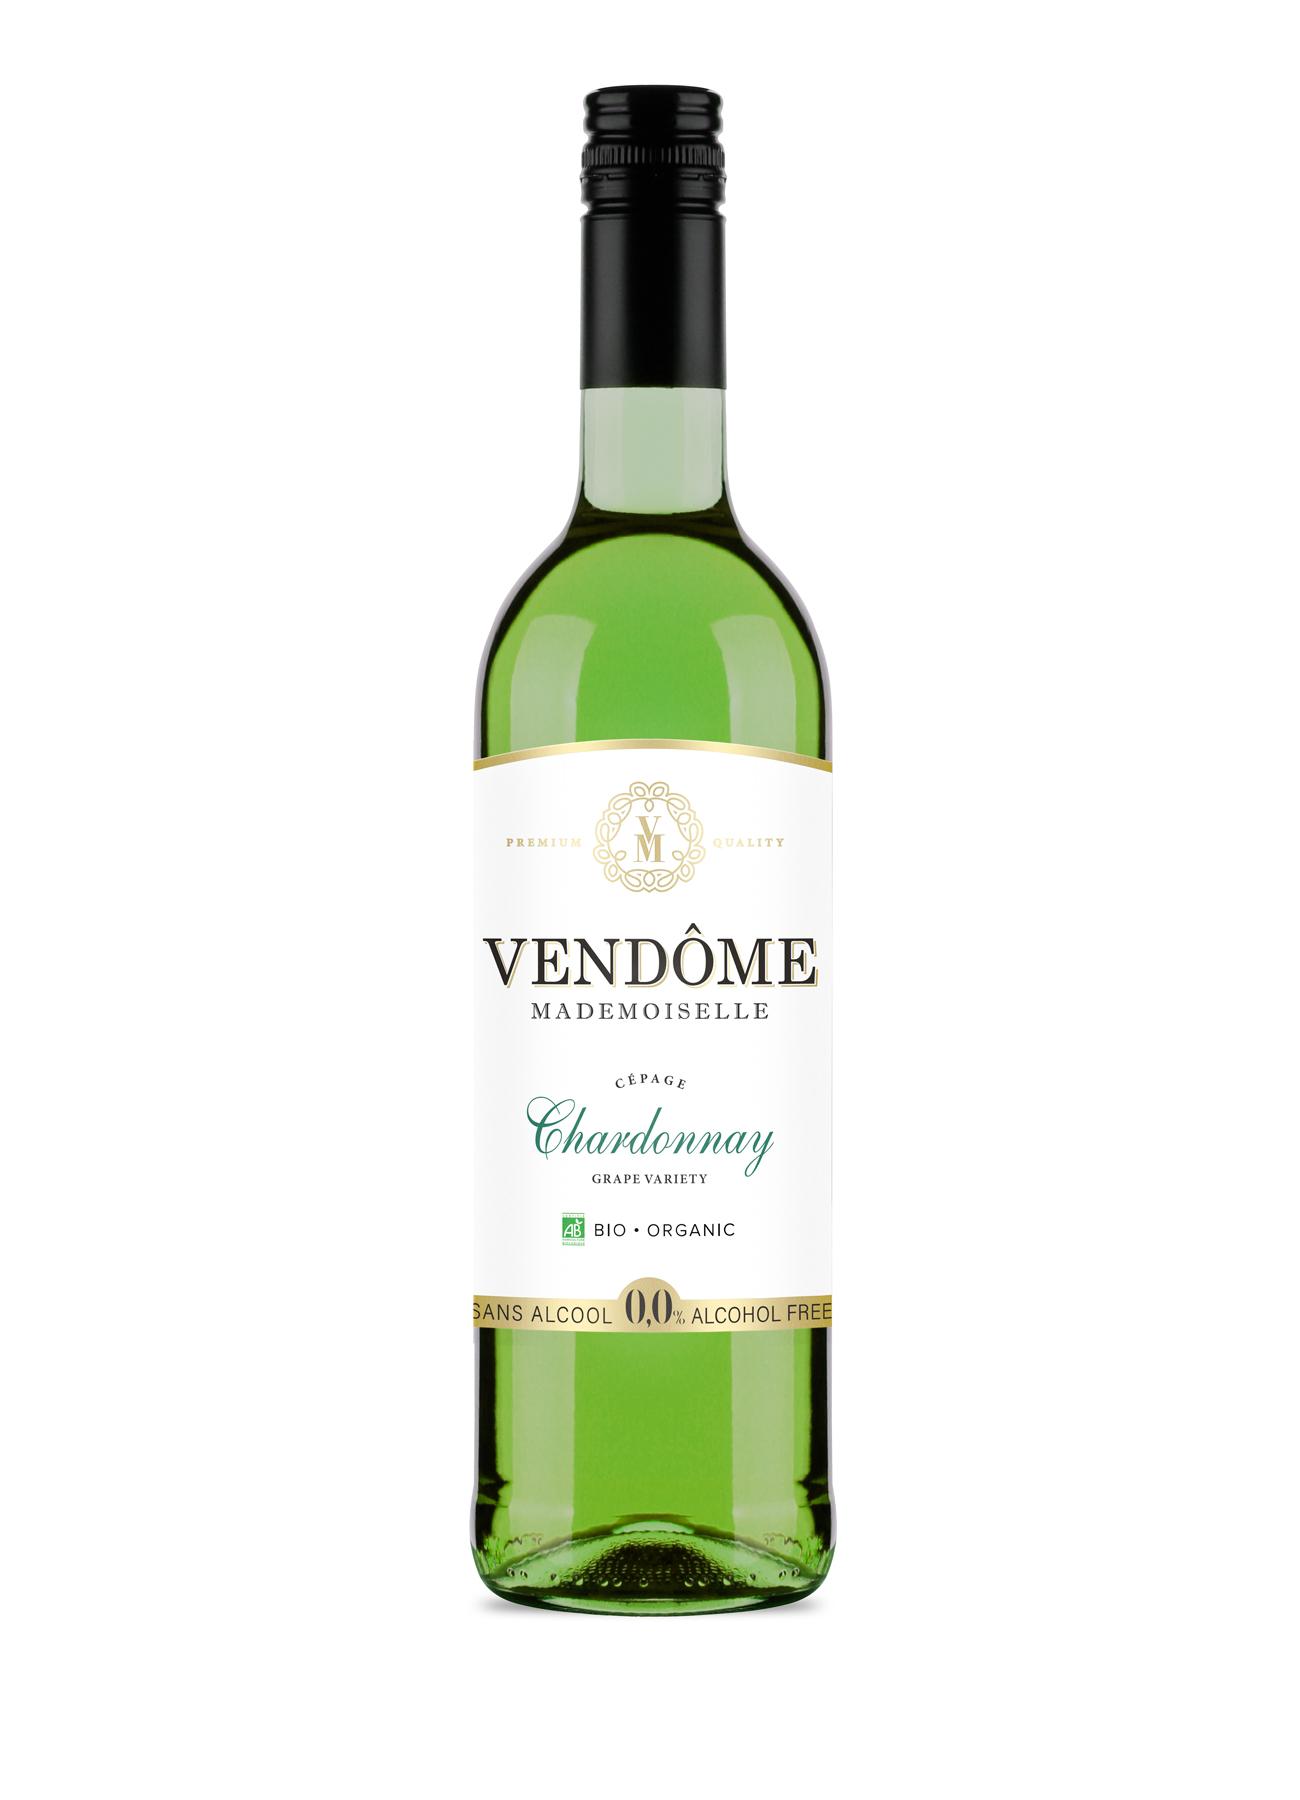 Vendome vin blanc Chardonnay sans alcool bio